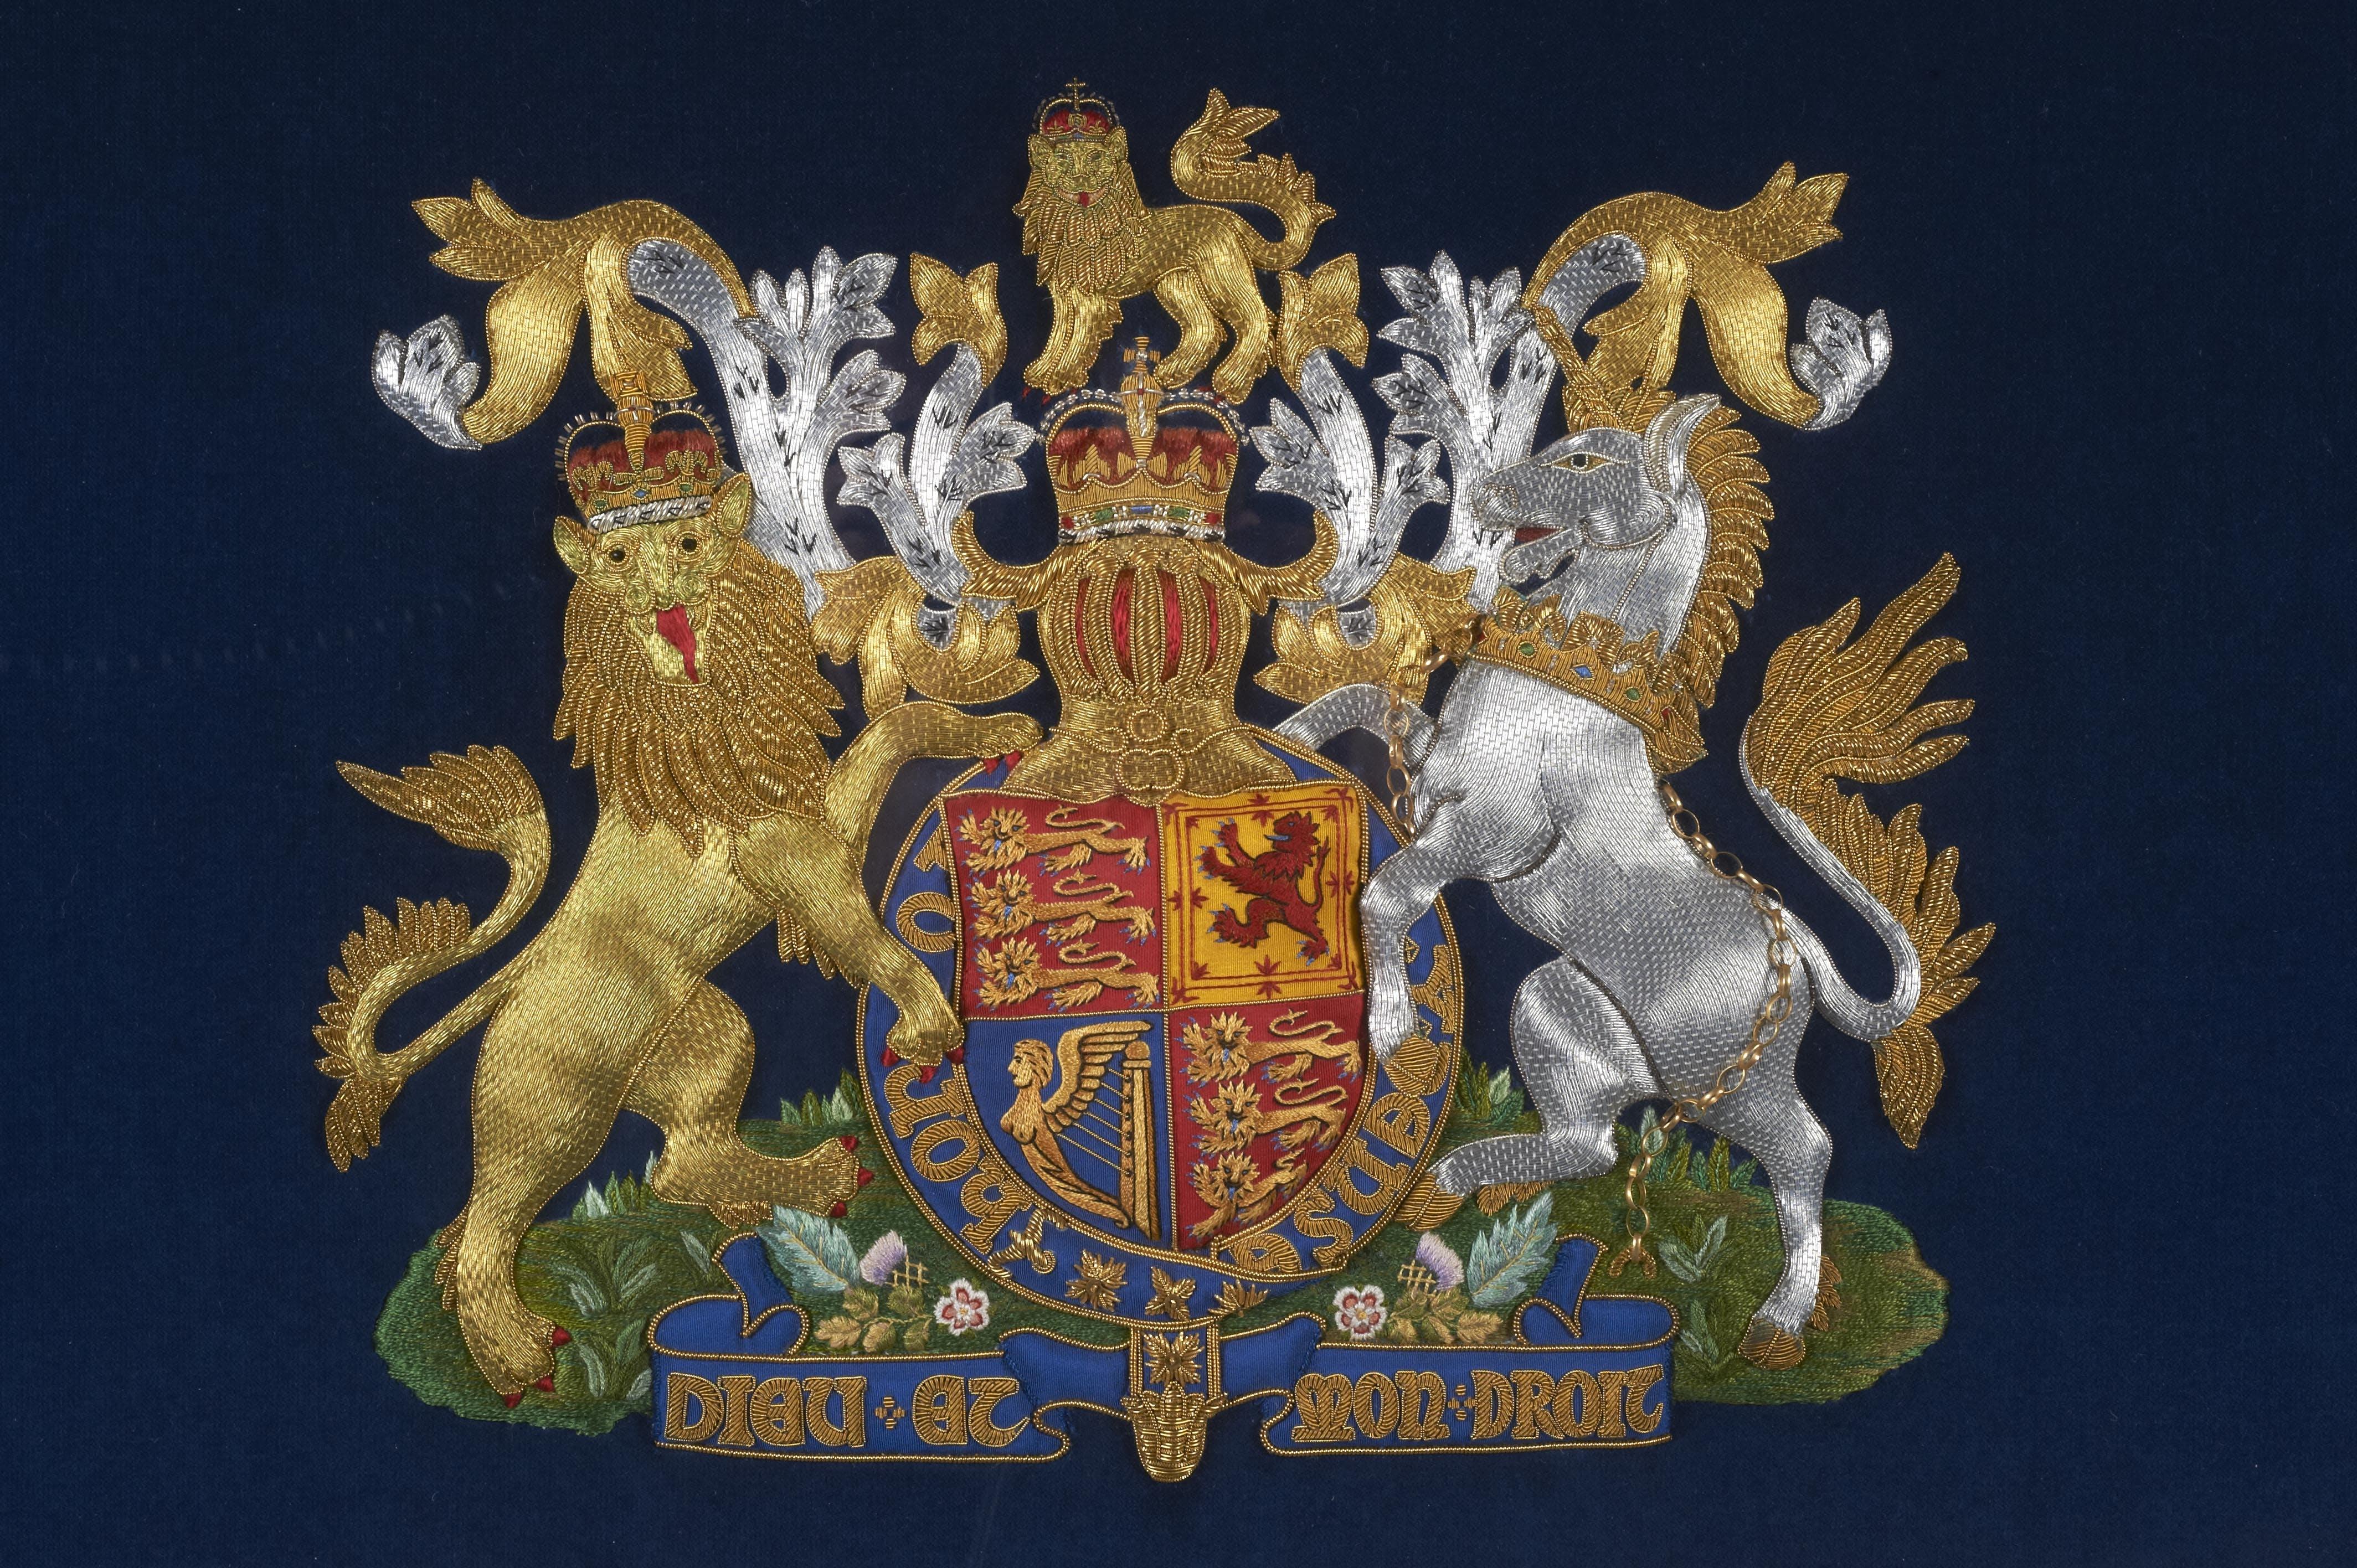 Royal School of Needlework crest